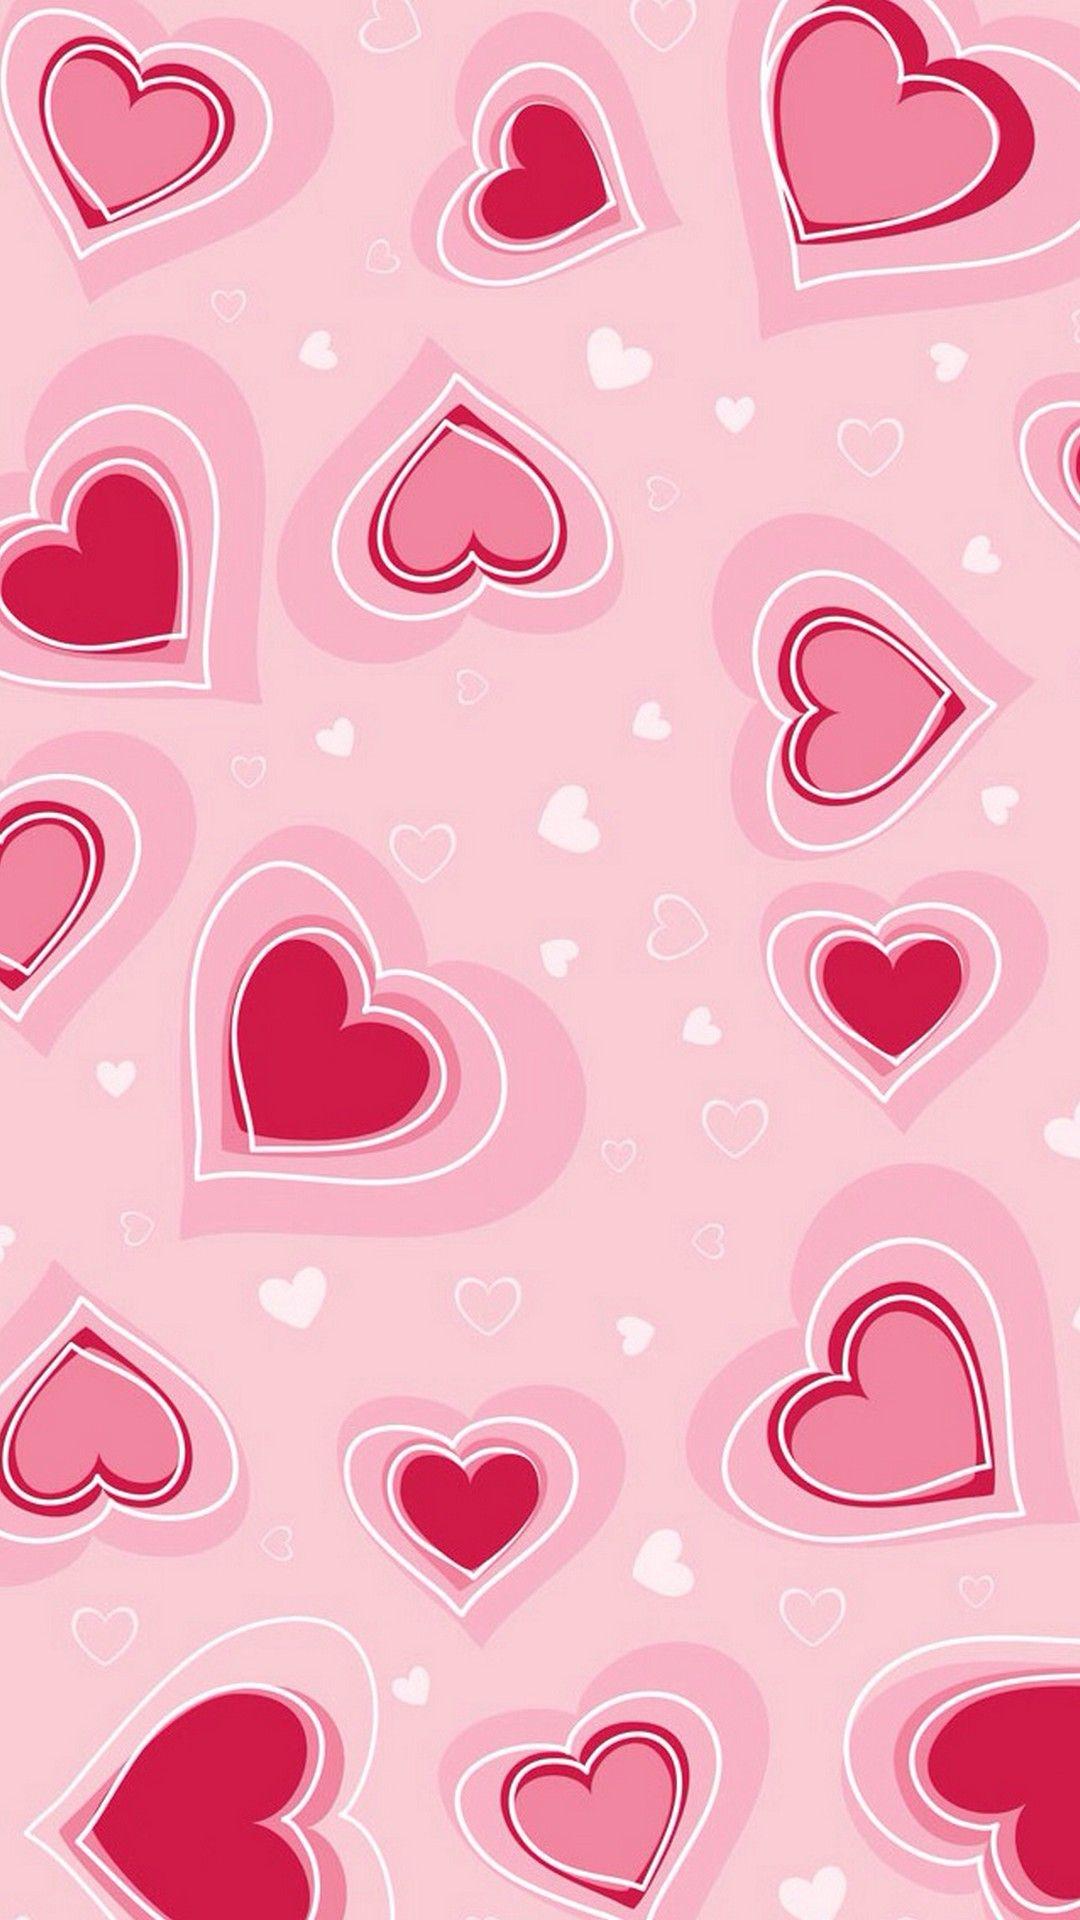 Valentine Wallpaper iPhone 5 Valentines wallpaper iphone